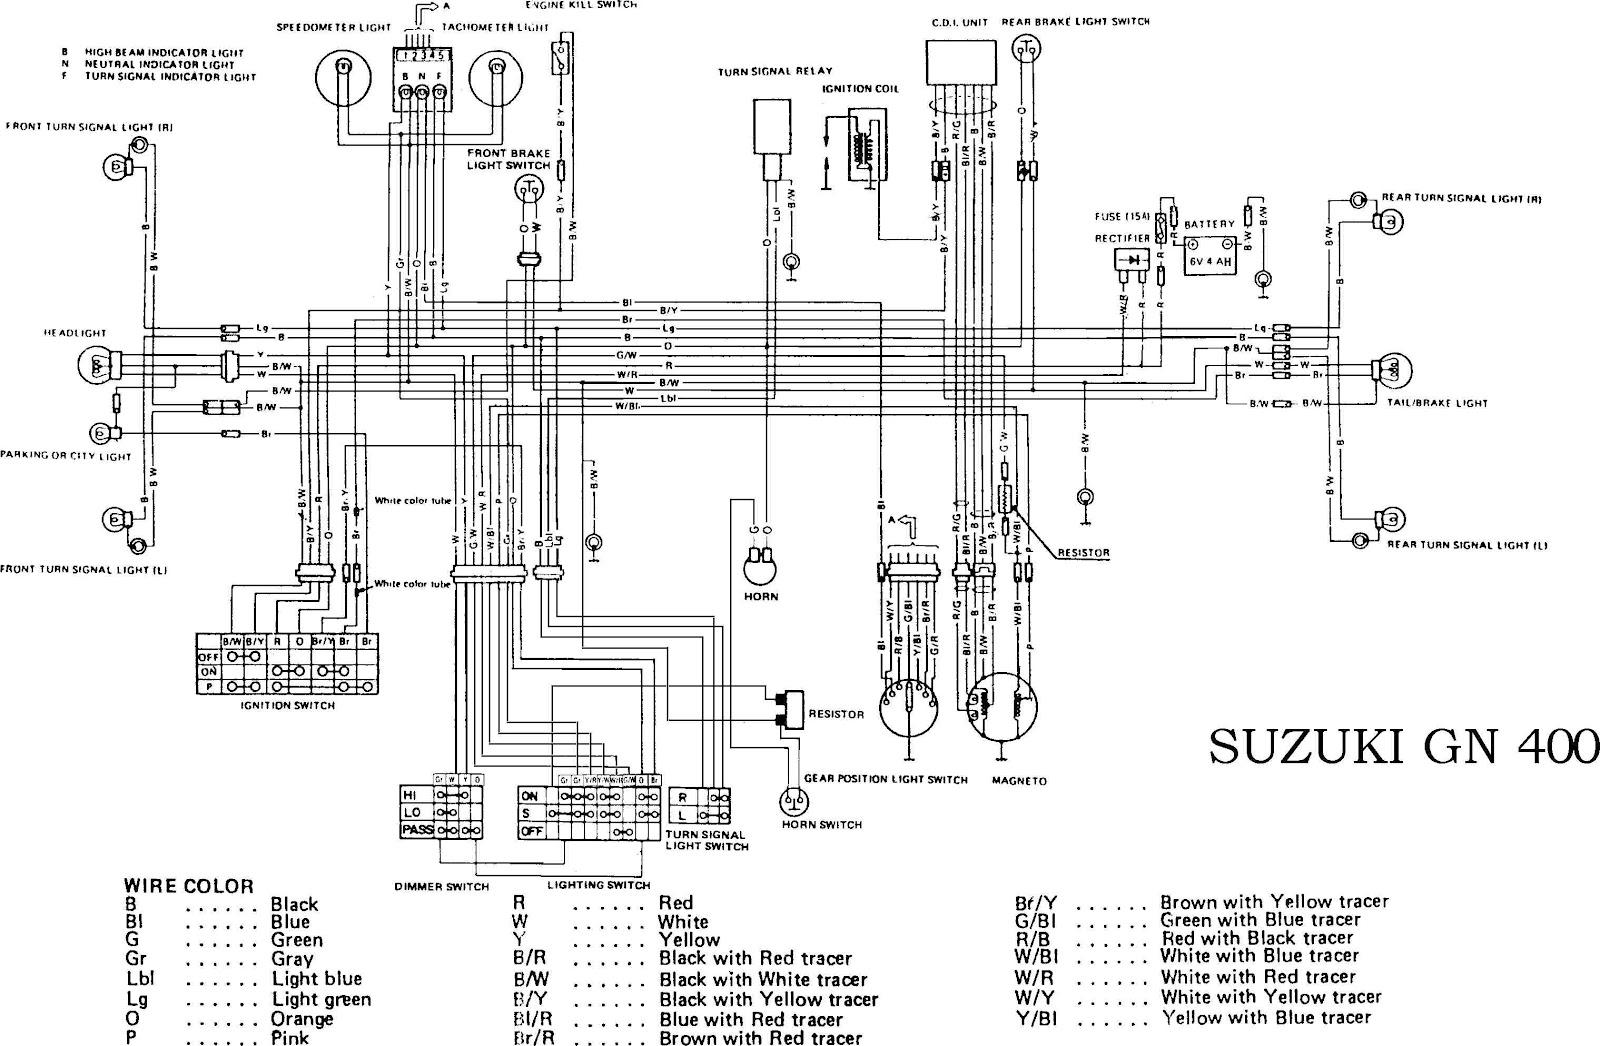 Kawasaki 220 Wiring Diagram additionally Post briggs And Stratton Parts Diagram 624254 furthermore 3qaaj Having Wiring Problem Kaf620 A2 Mule 2510 4x4 moreover 3qg65 John Deere Gator Heating Fan Motor as well F2770. on john deere kawasaki ignition parts